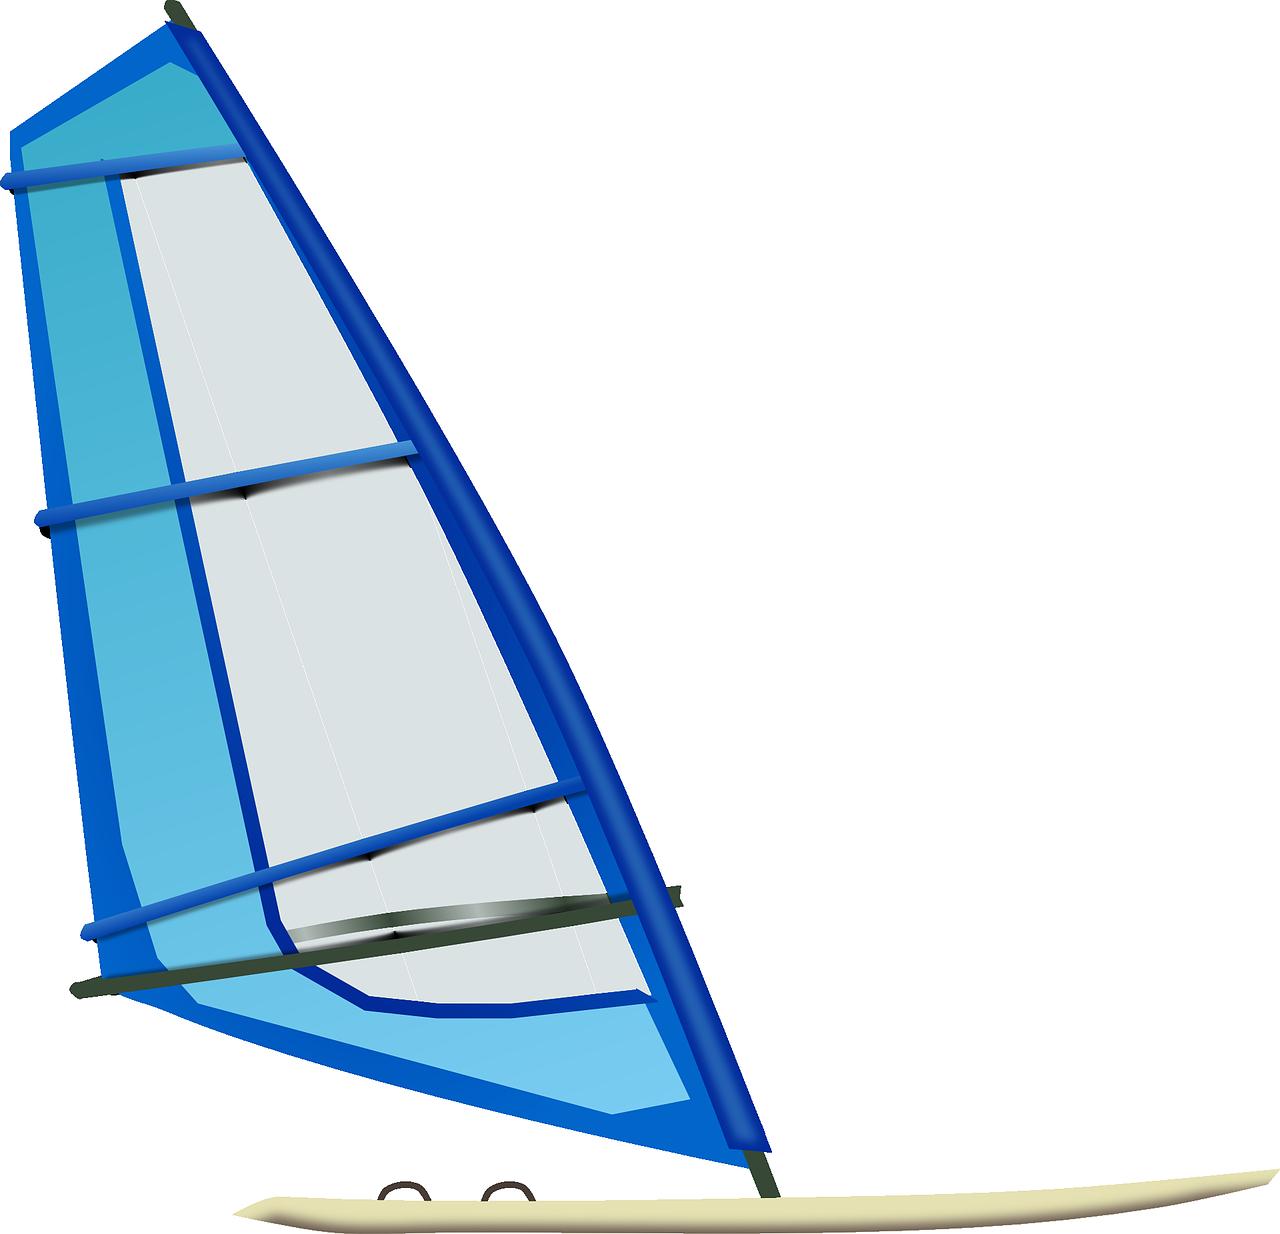 Mayflower clipart sail boat.  clip art black